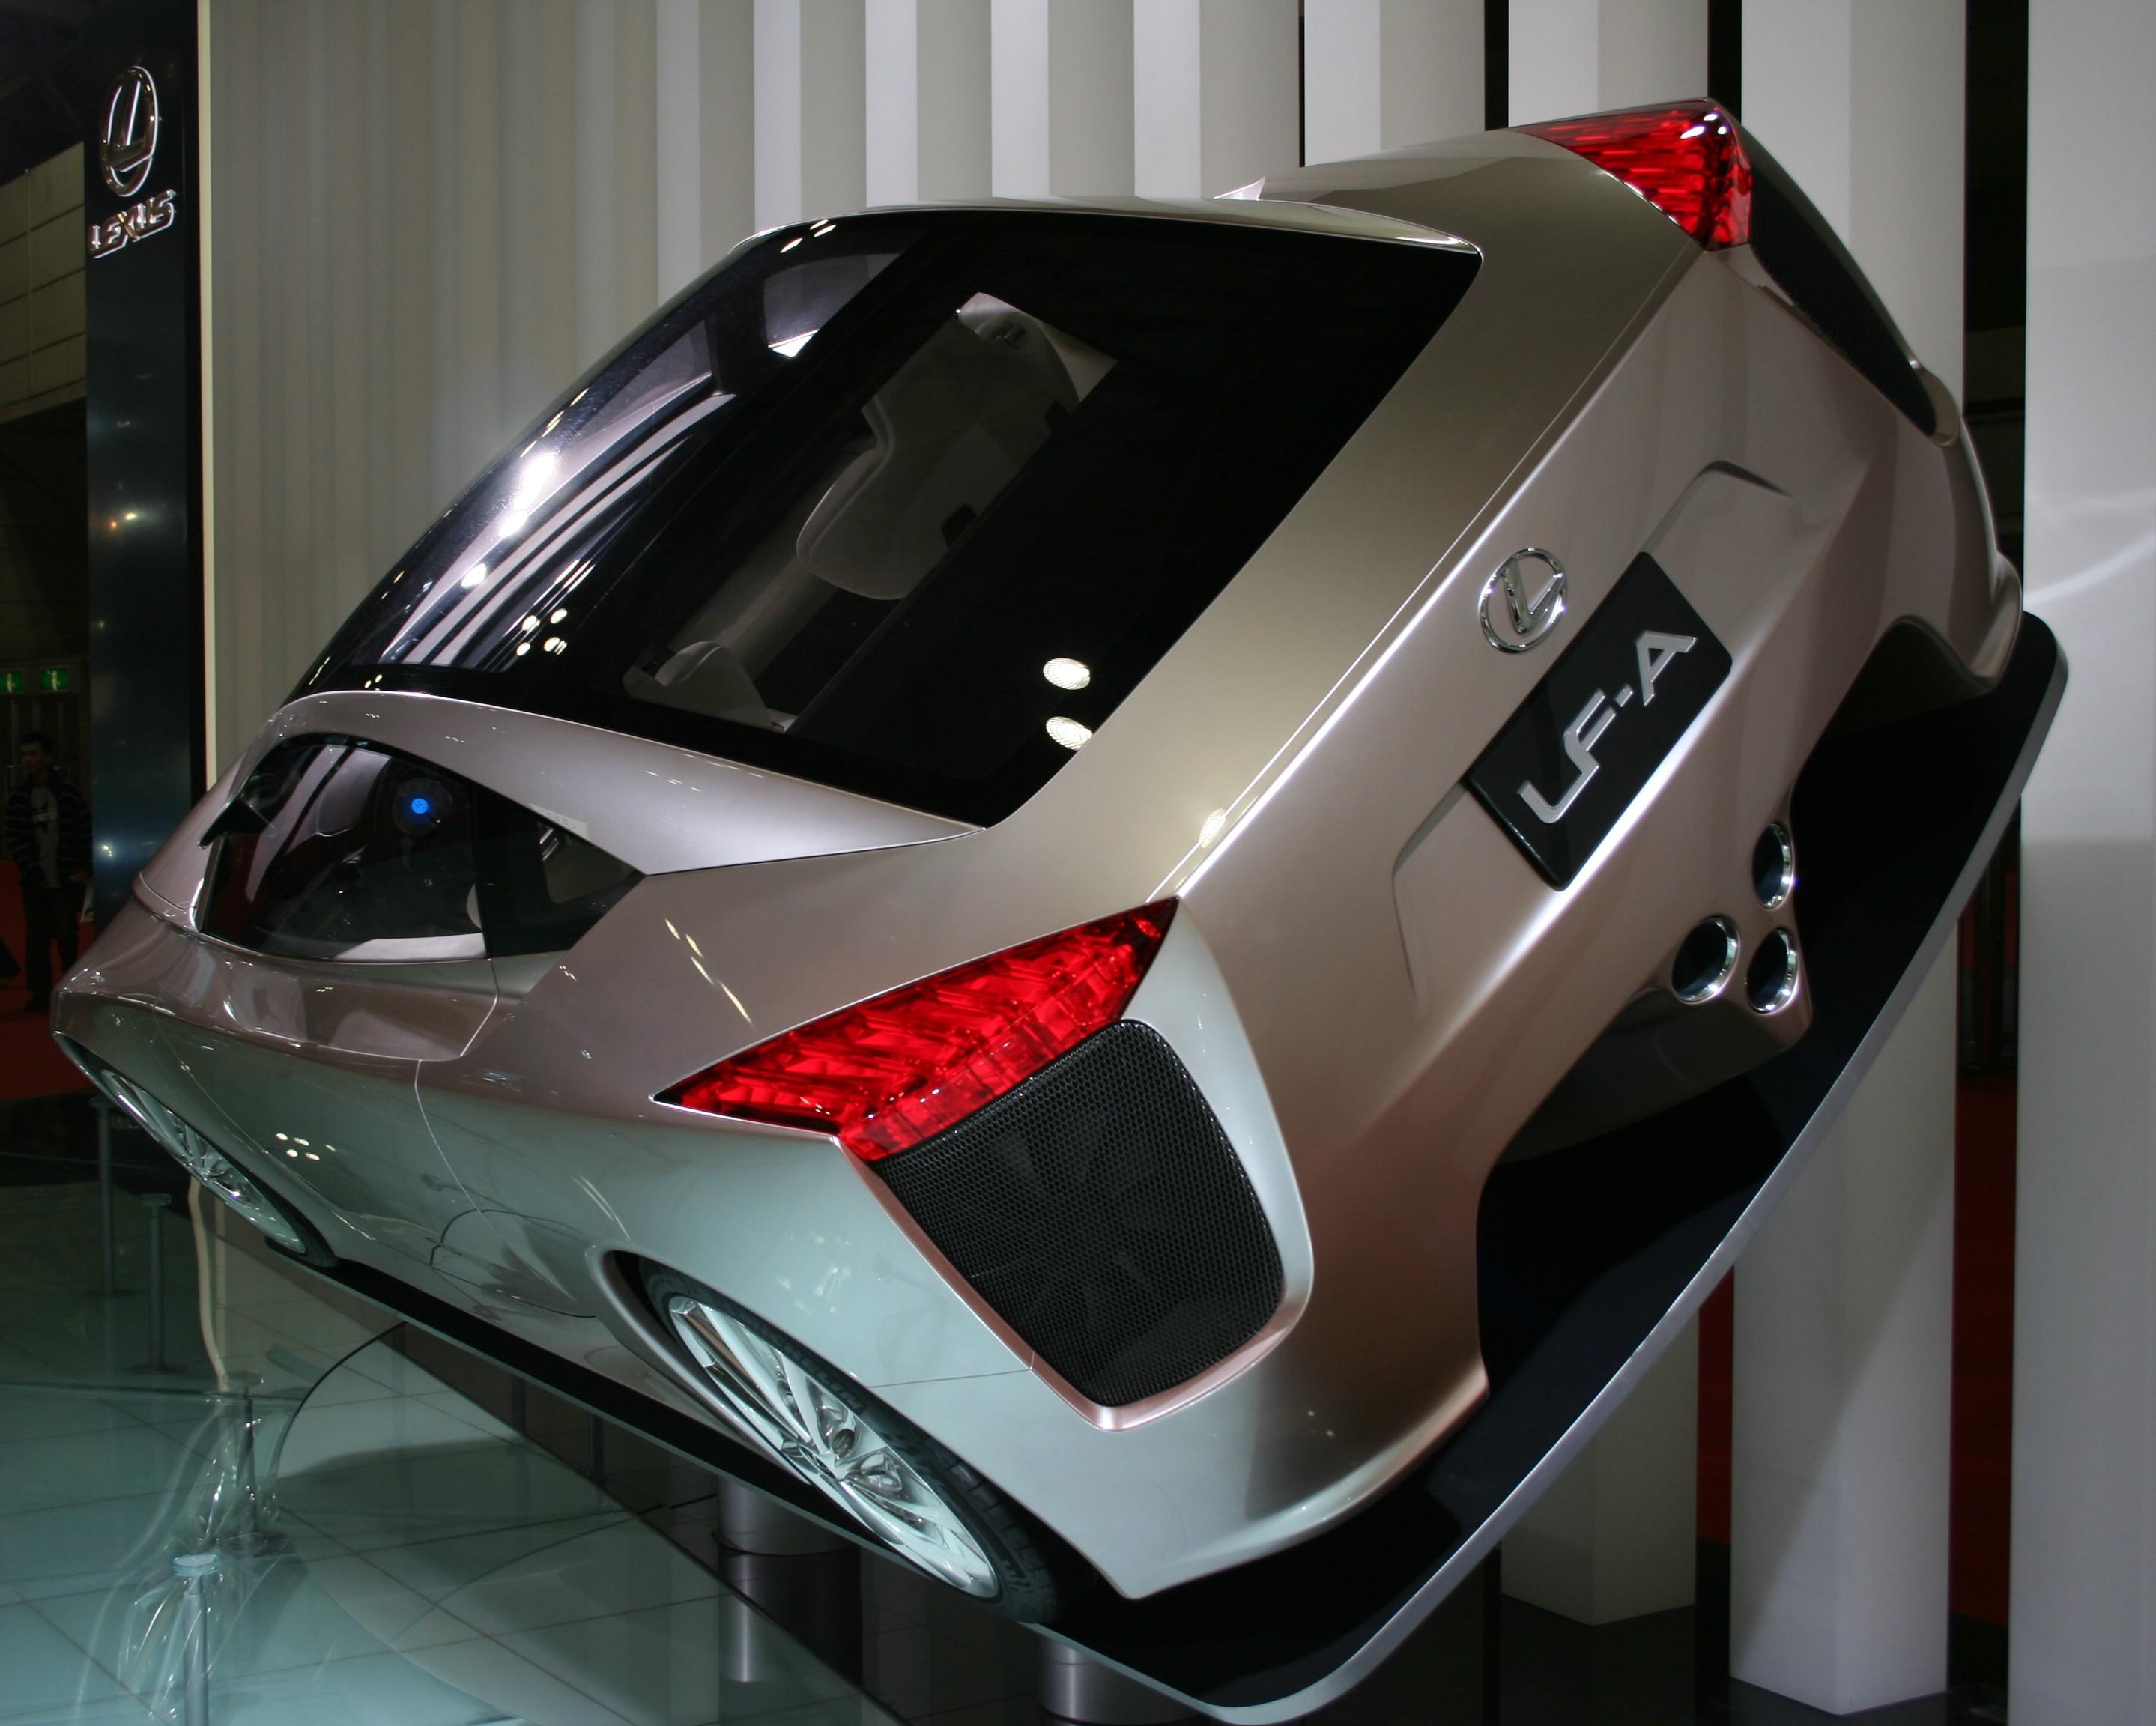 Lexus LFA Supercar Pricing [Archive] - JDM Style Tuning Forum